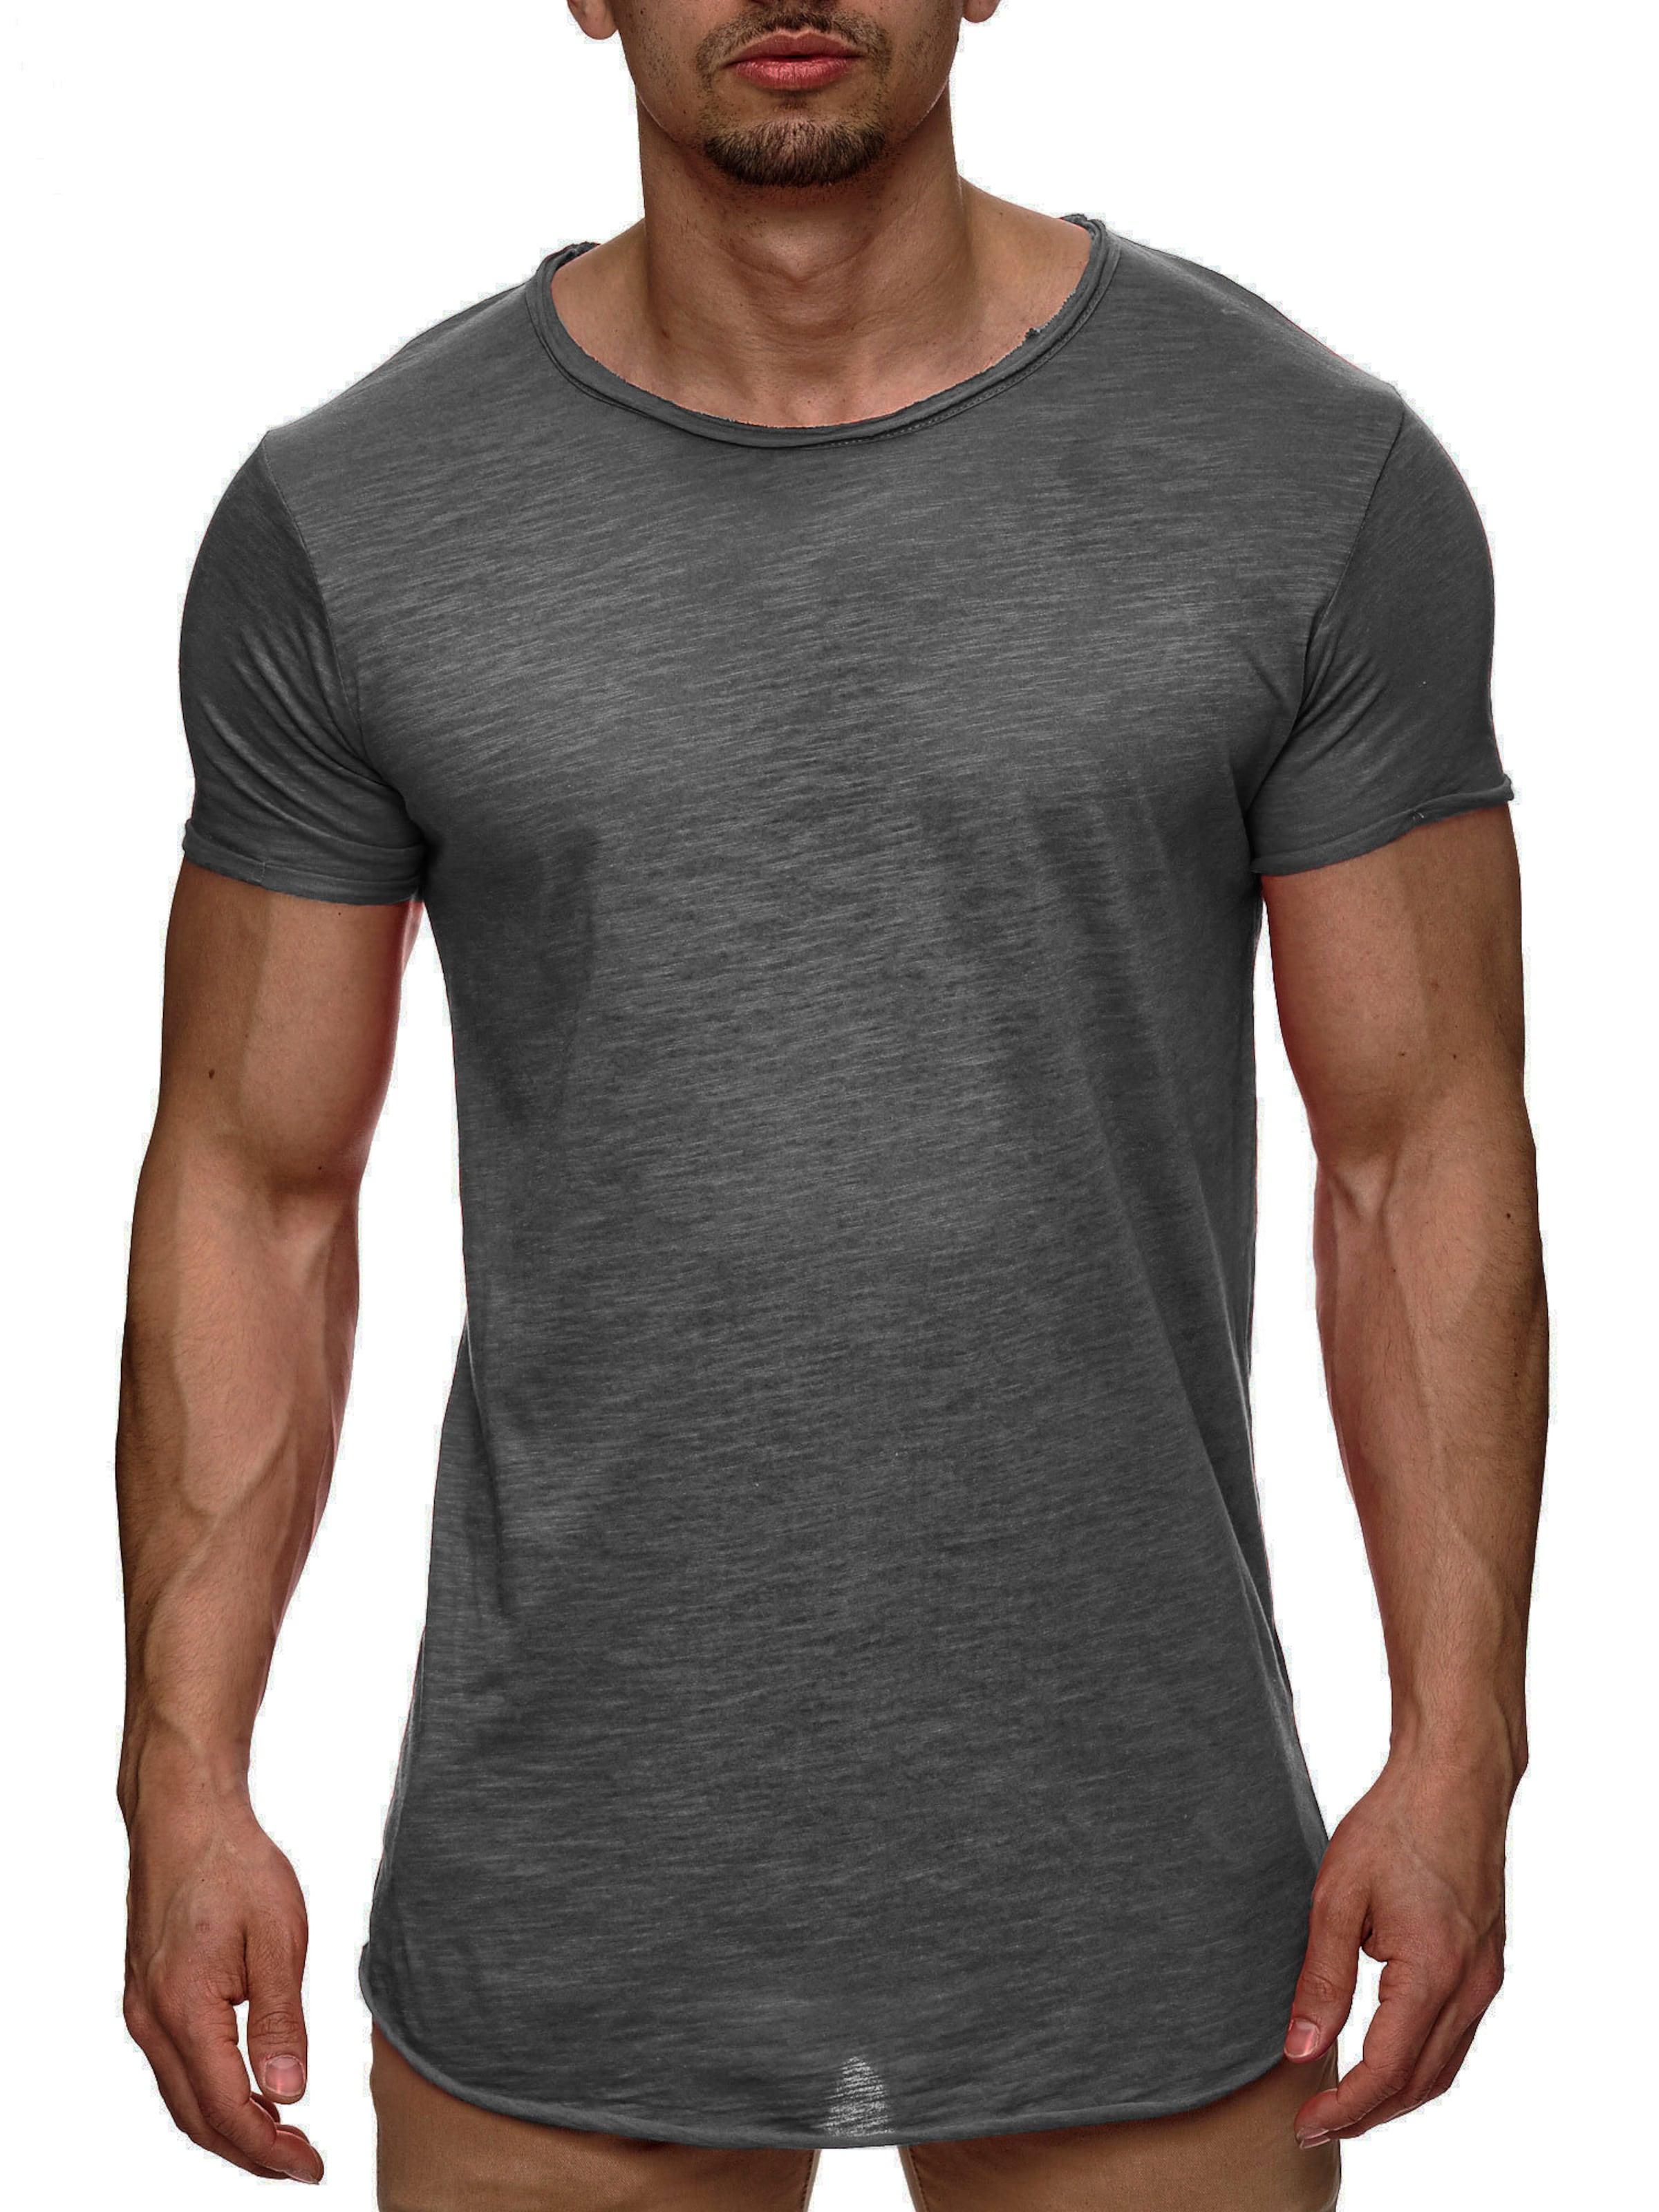 Gris T 'willbur' shirt Jeans En Indicode Chiné 7Yb6yfgv